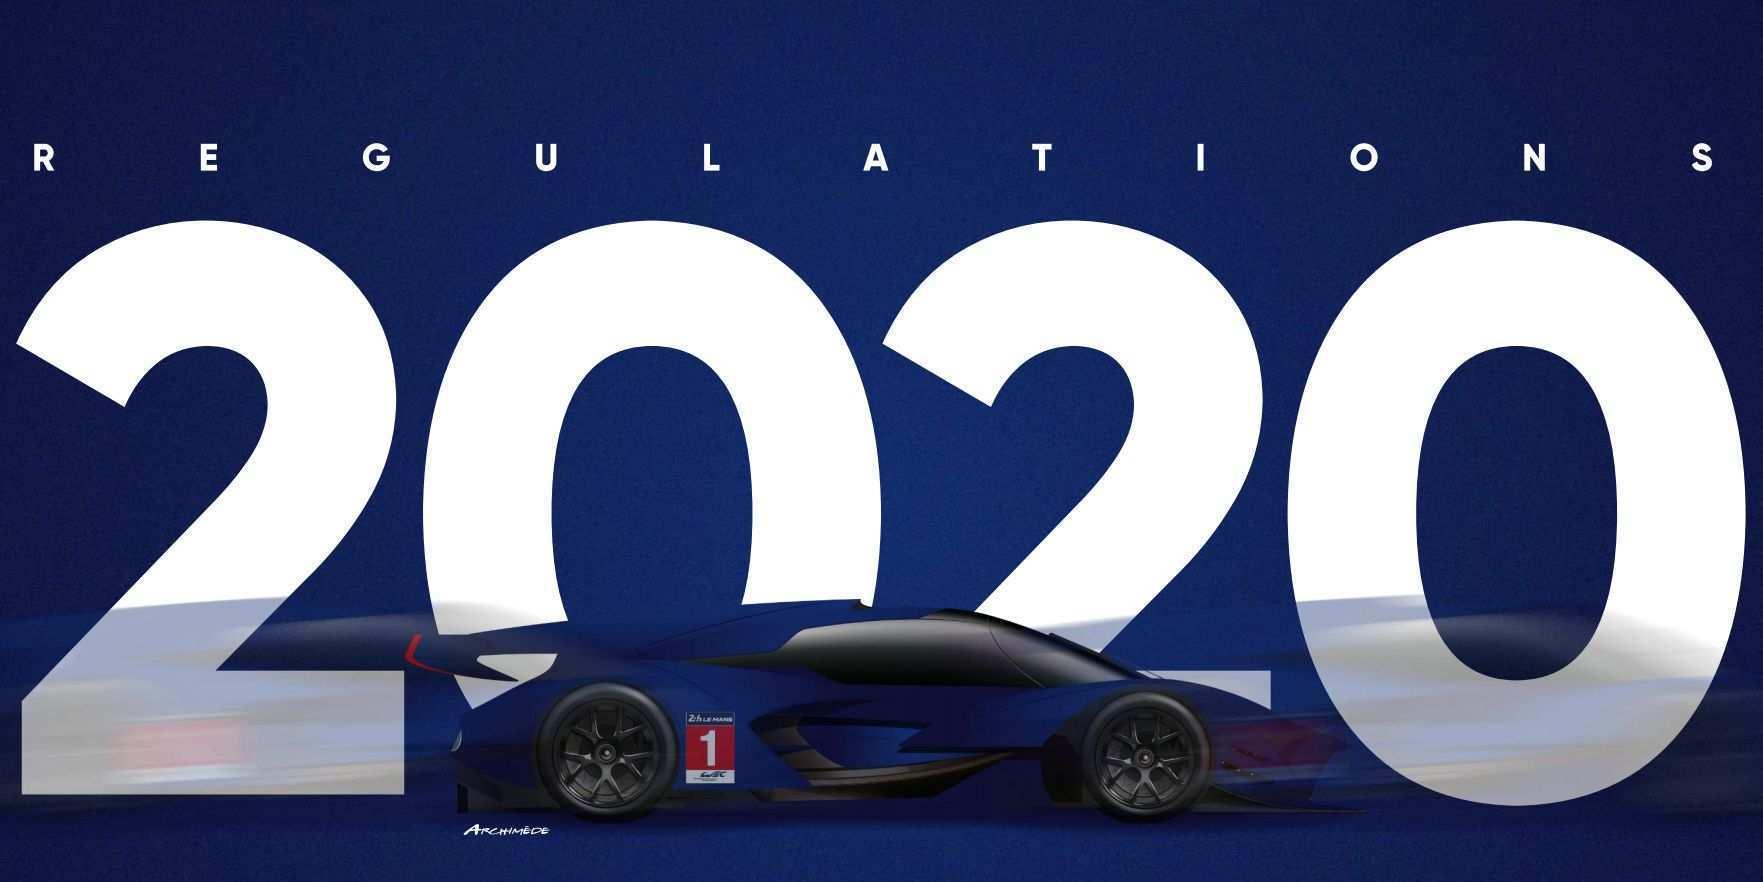 30 All New Peugeot Le Mans 2020 Research New for Peugeot Le Mans 2020